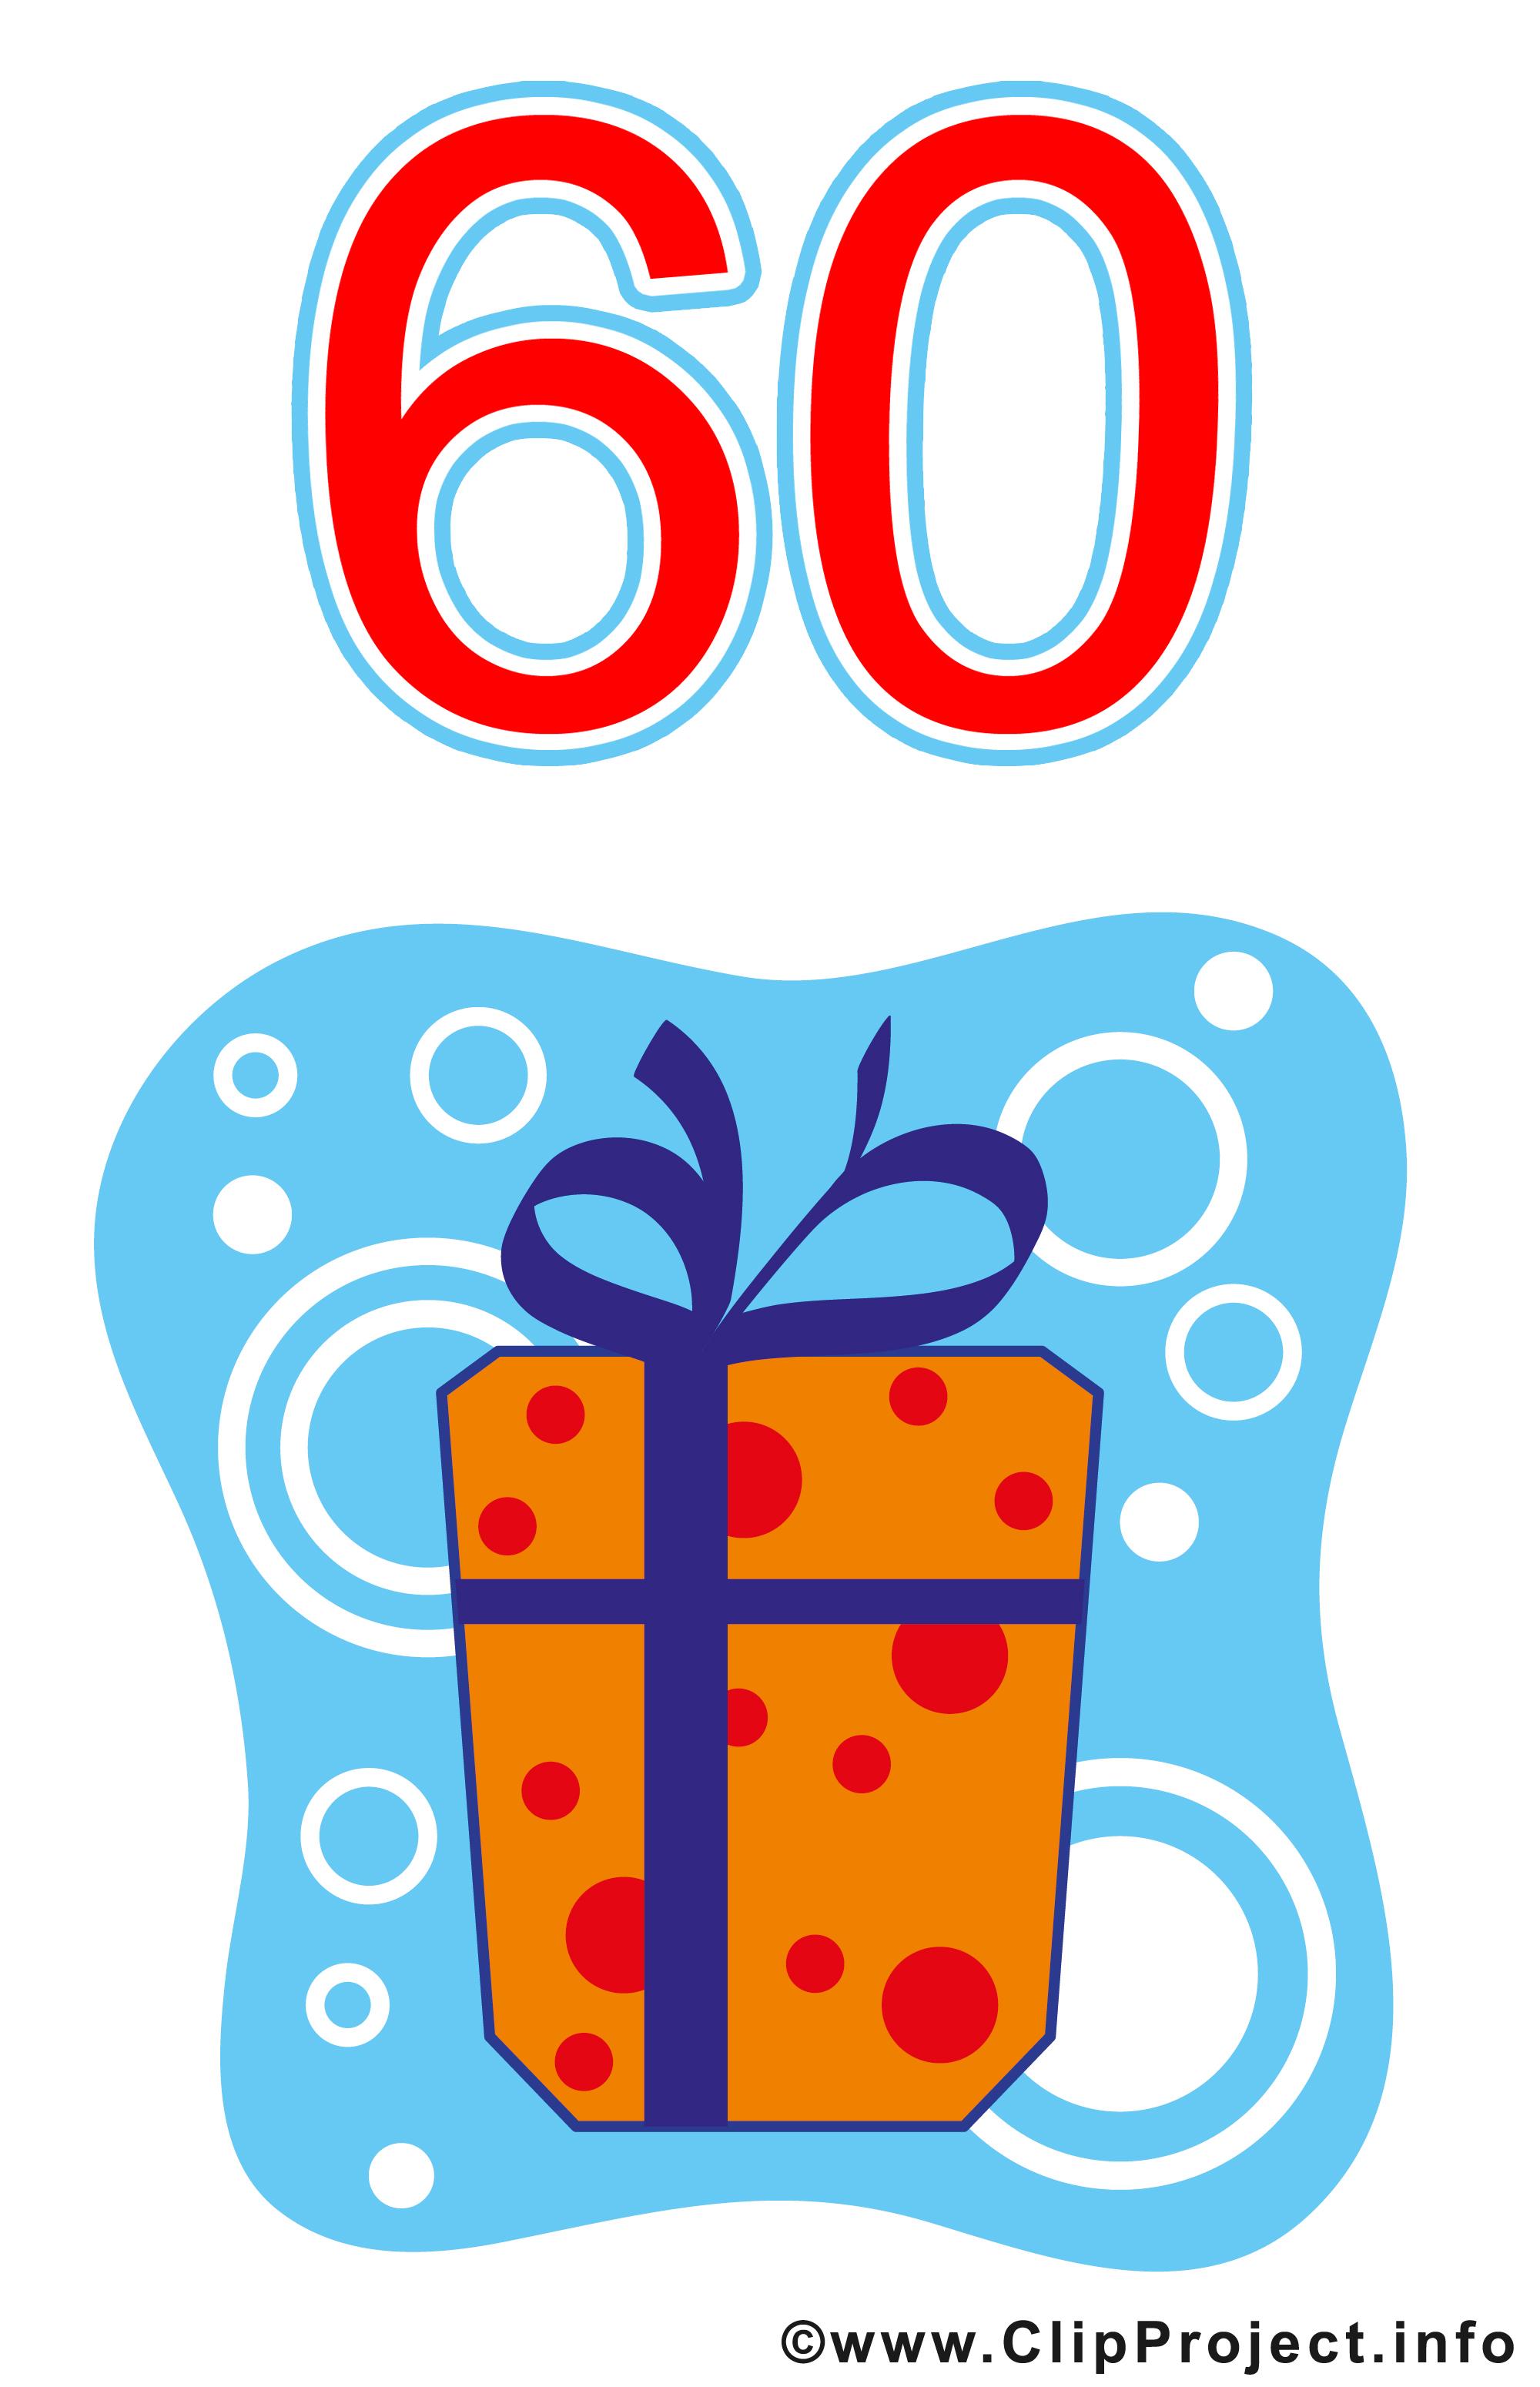 Clipart einladung 60 geburtstag clipart free library Geschenk zum 60 Geburtstag Clipart gratis clipart free library